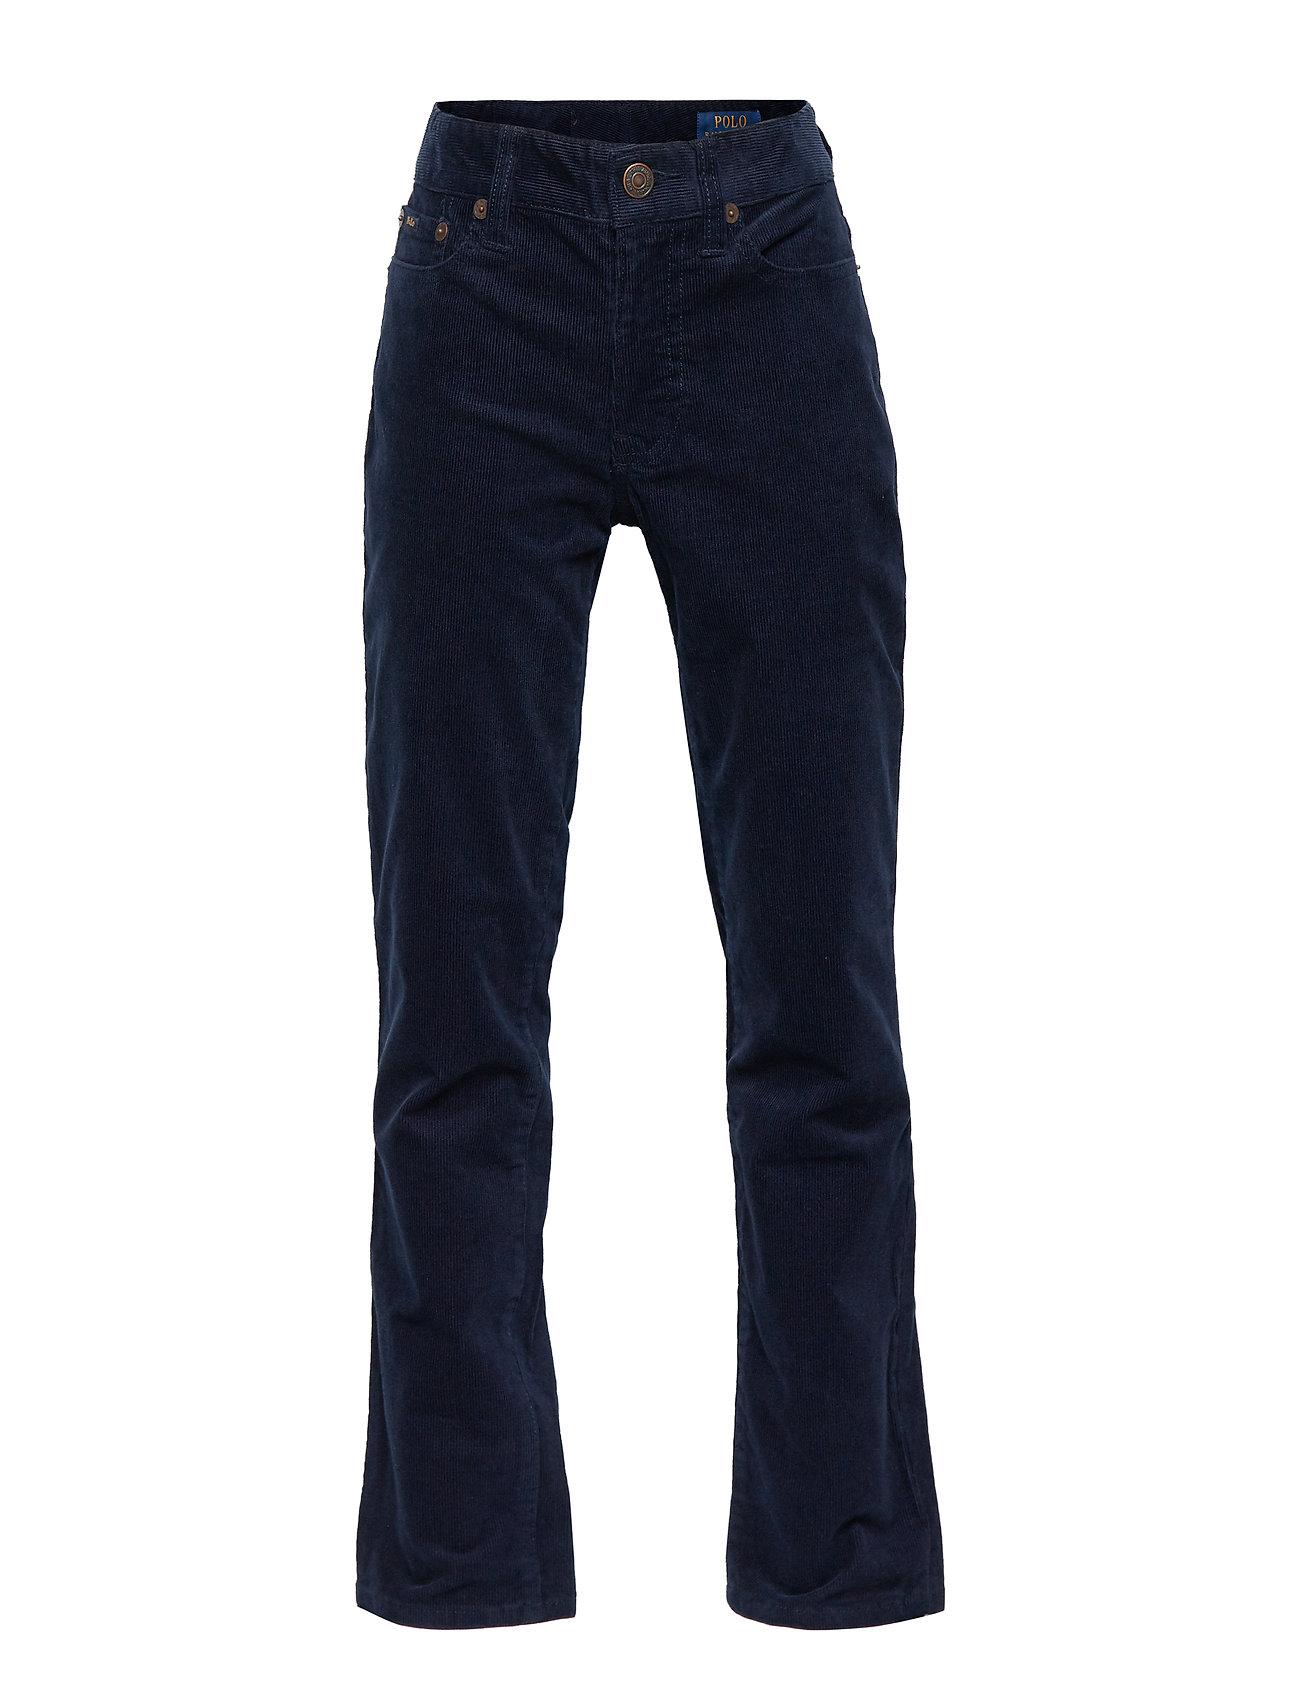 Ralph Lauren Kids Varick Corduroy Skinny Pant - FRENCH NAVY